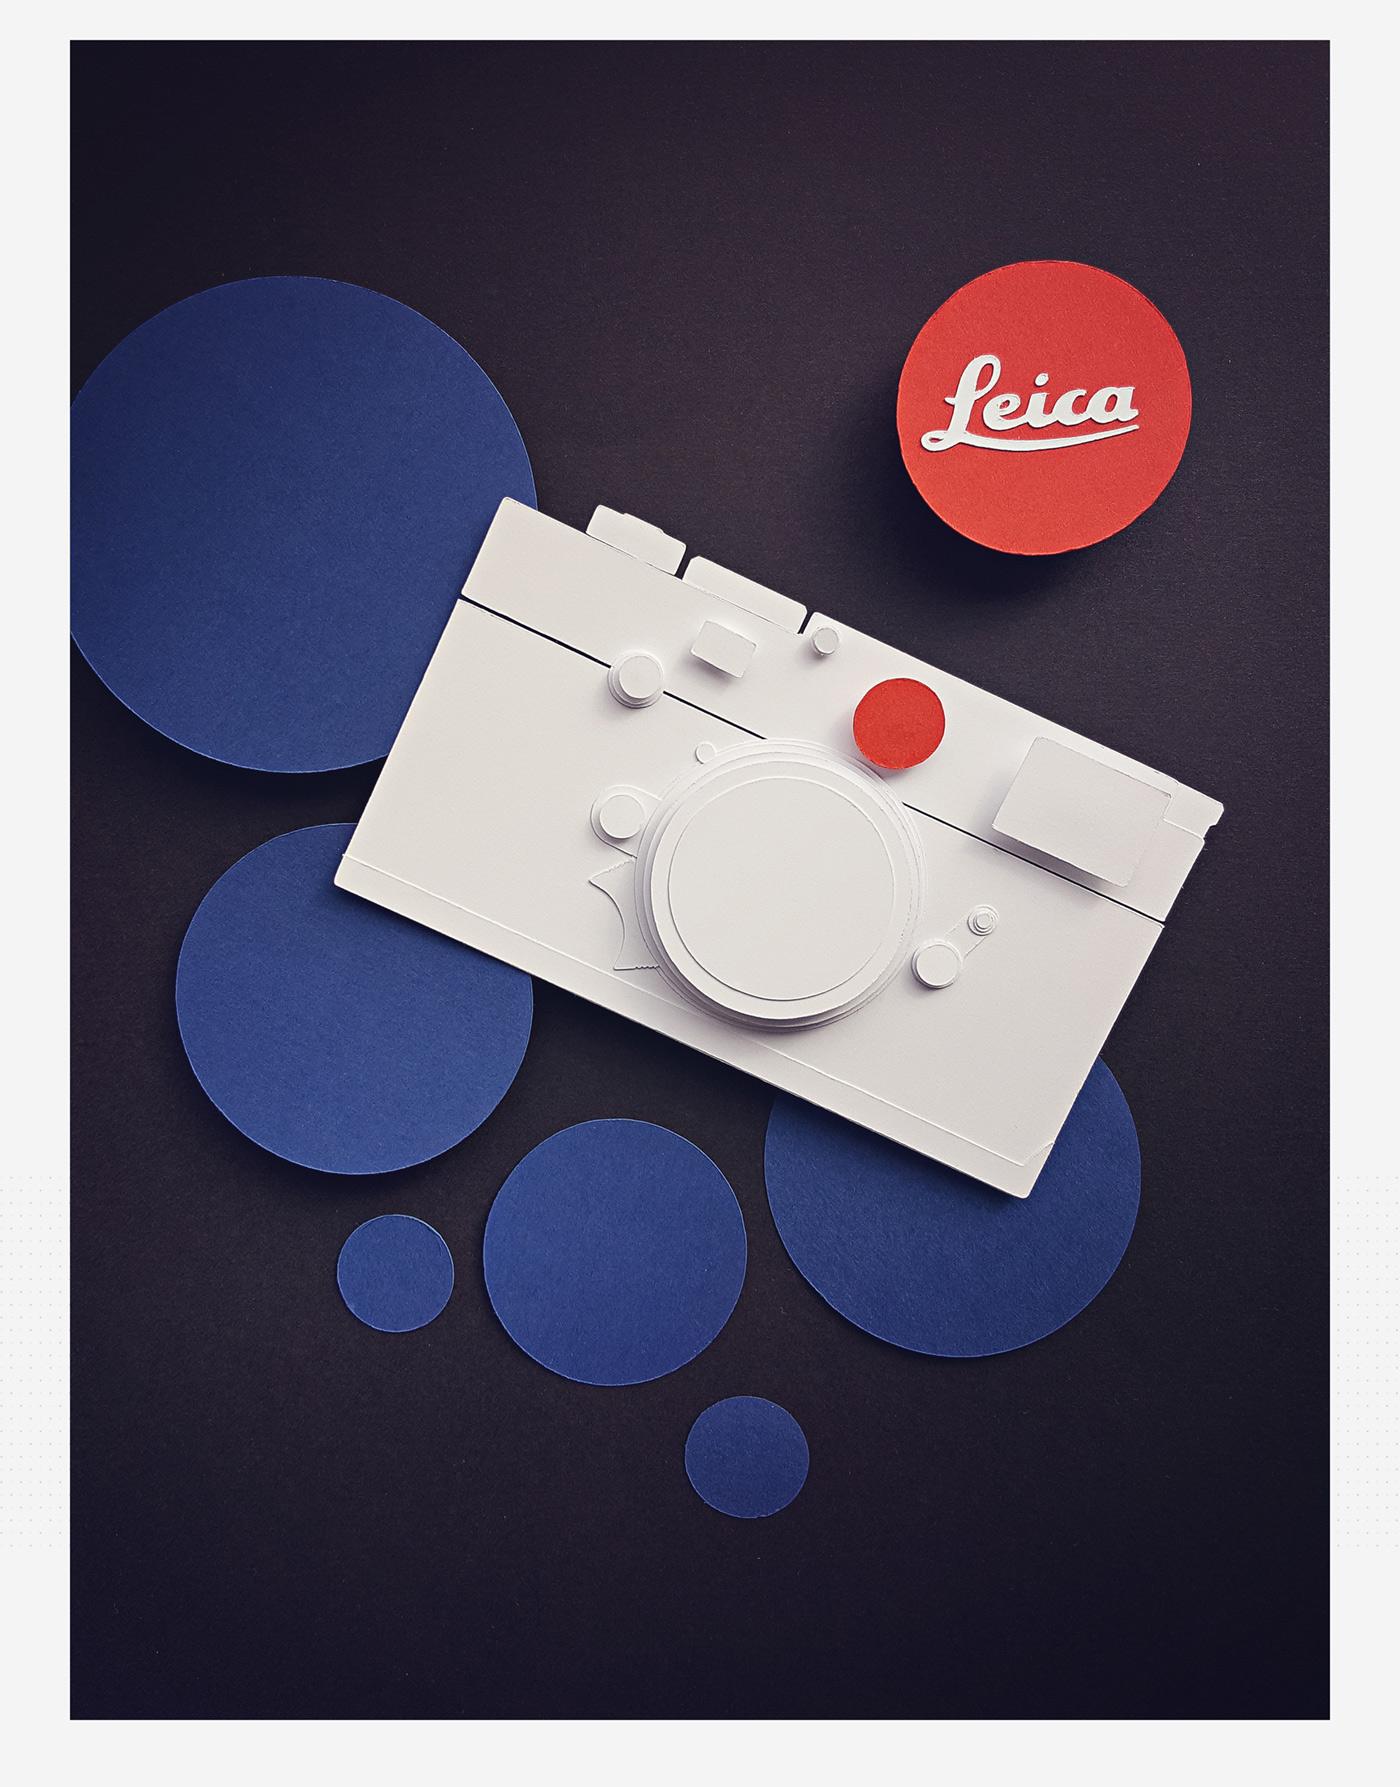 Leica m10 paper papercraft camera red handmade papercut paperwork Photography